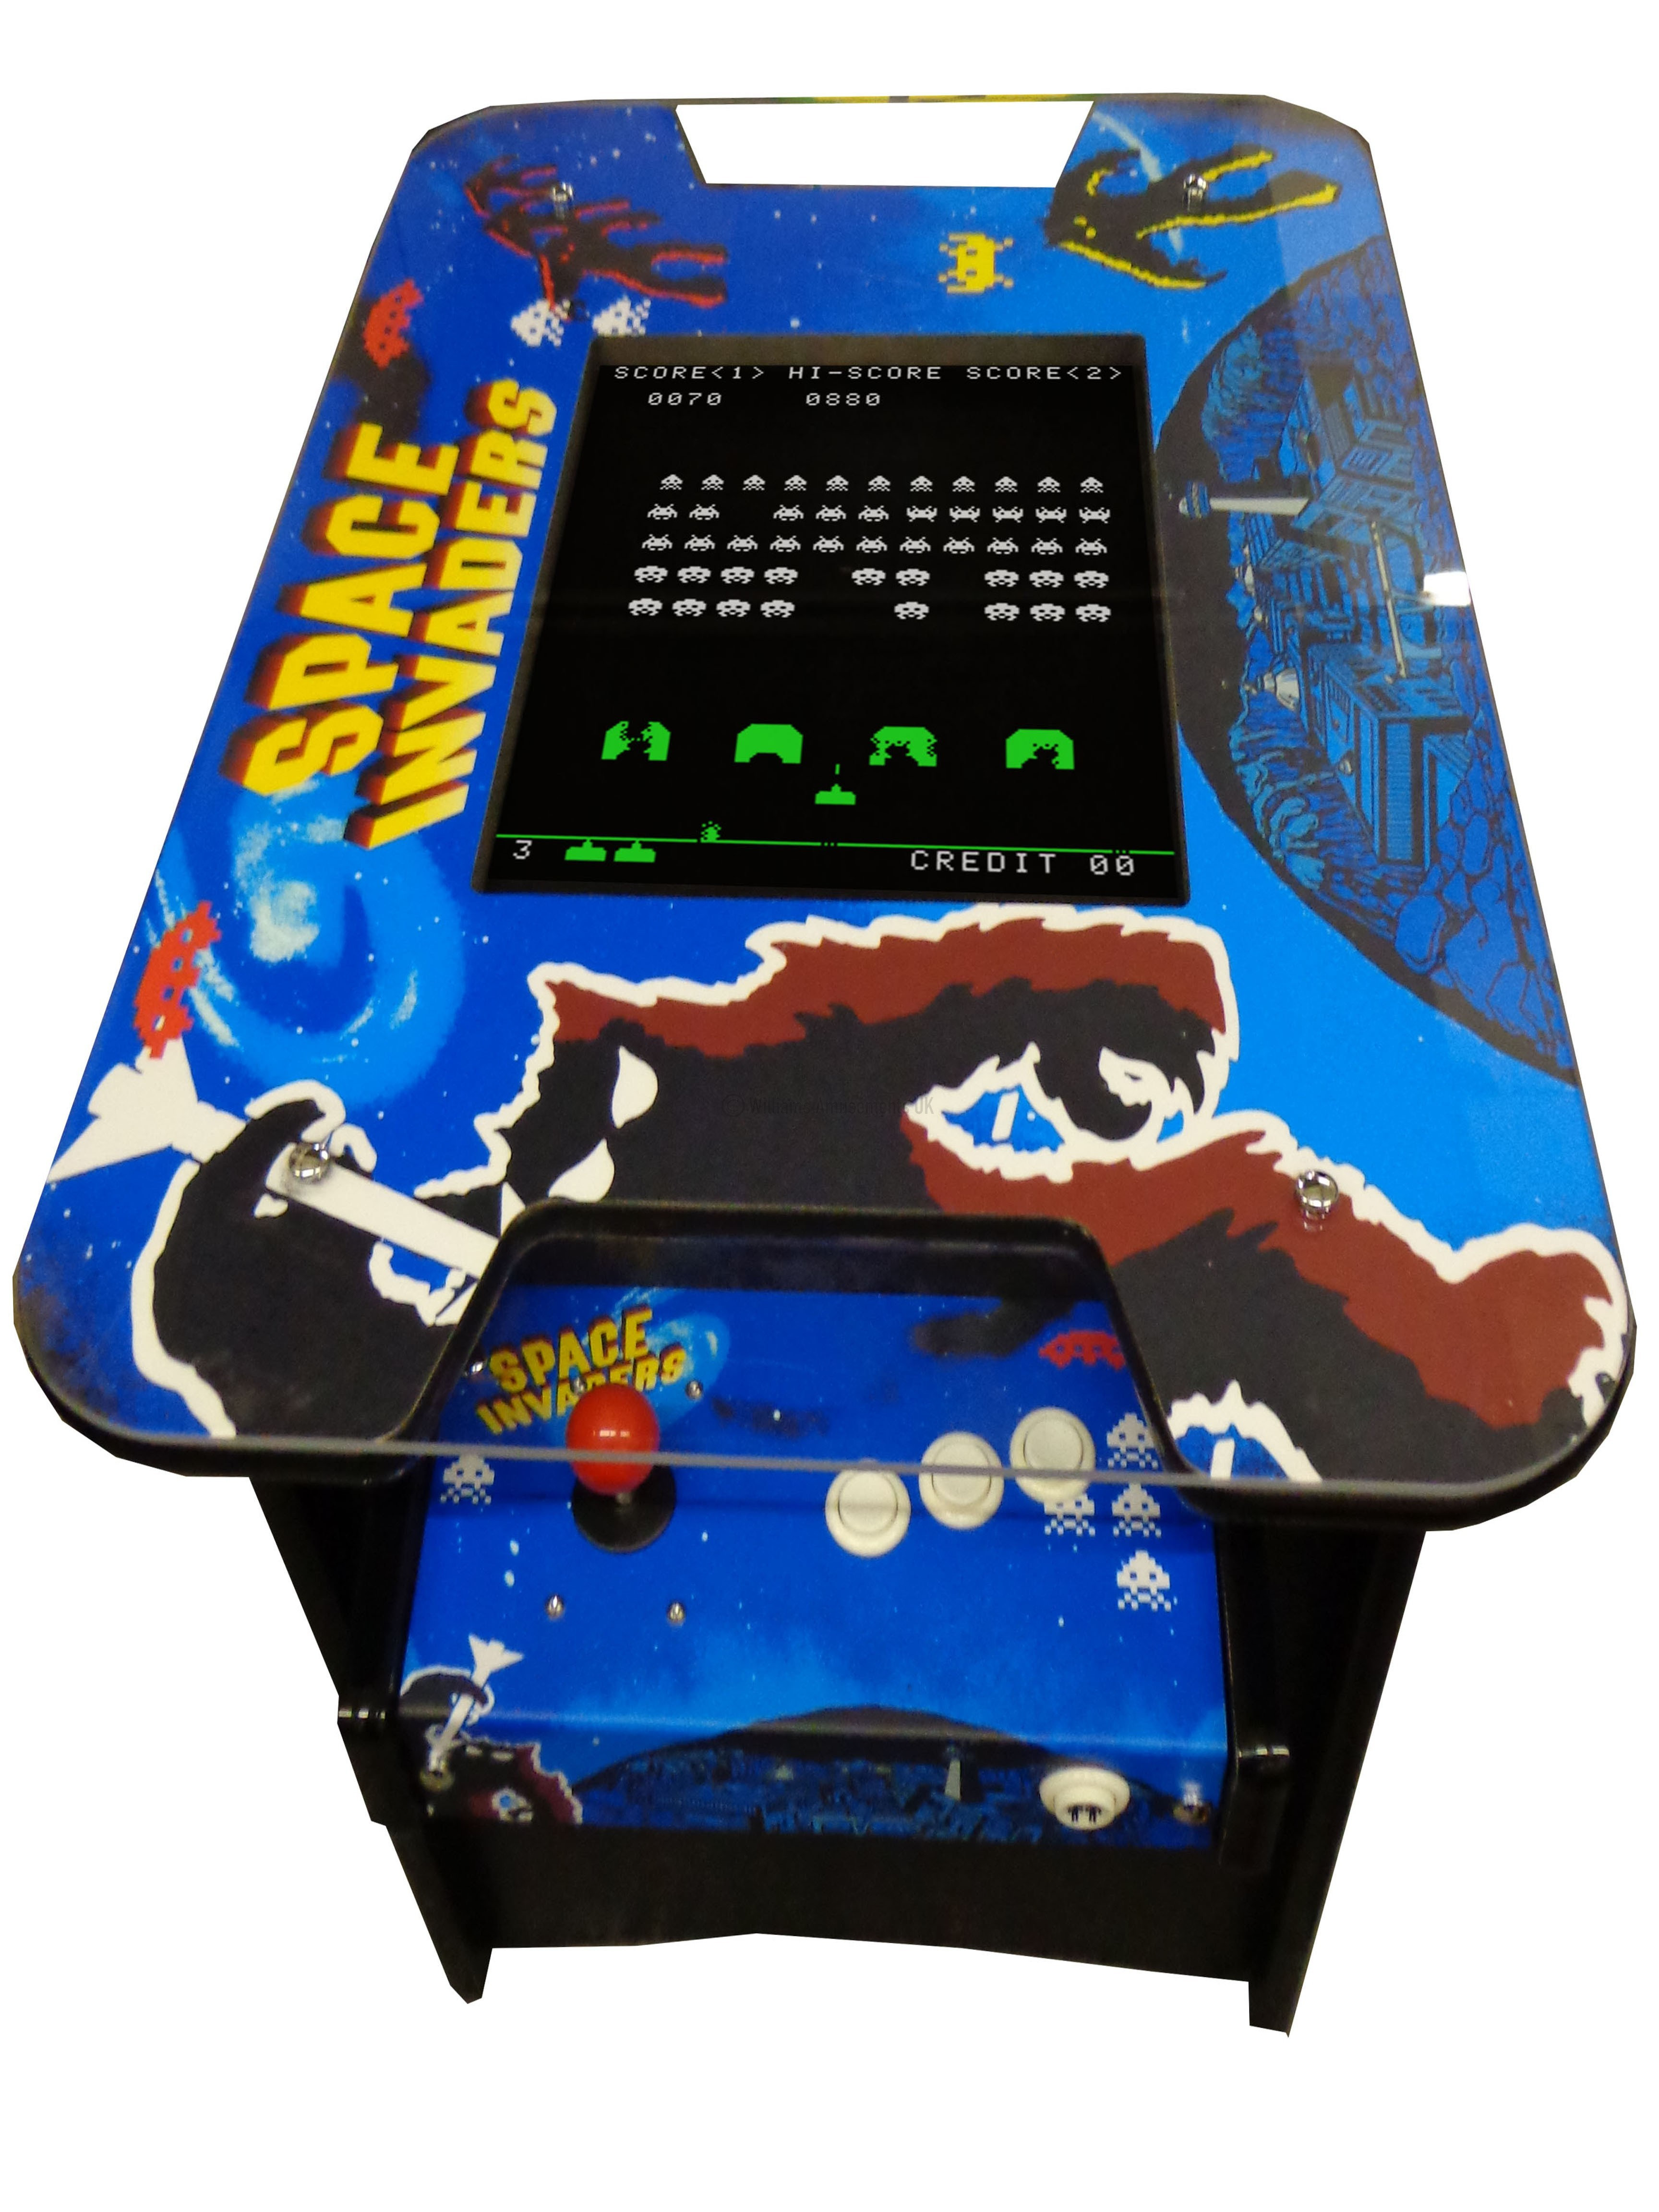 space invaders arcade machine for sale australia